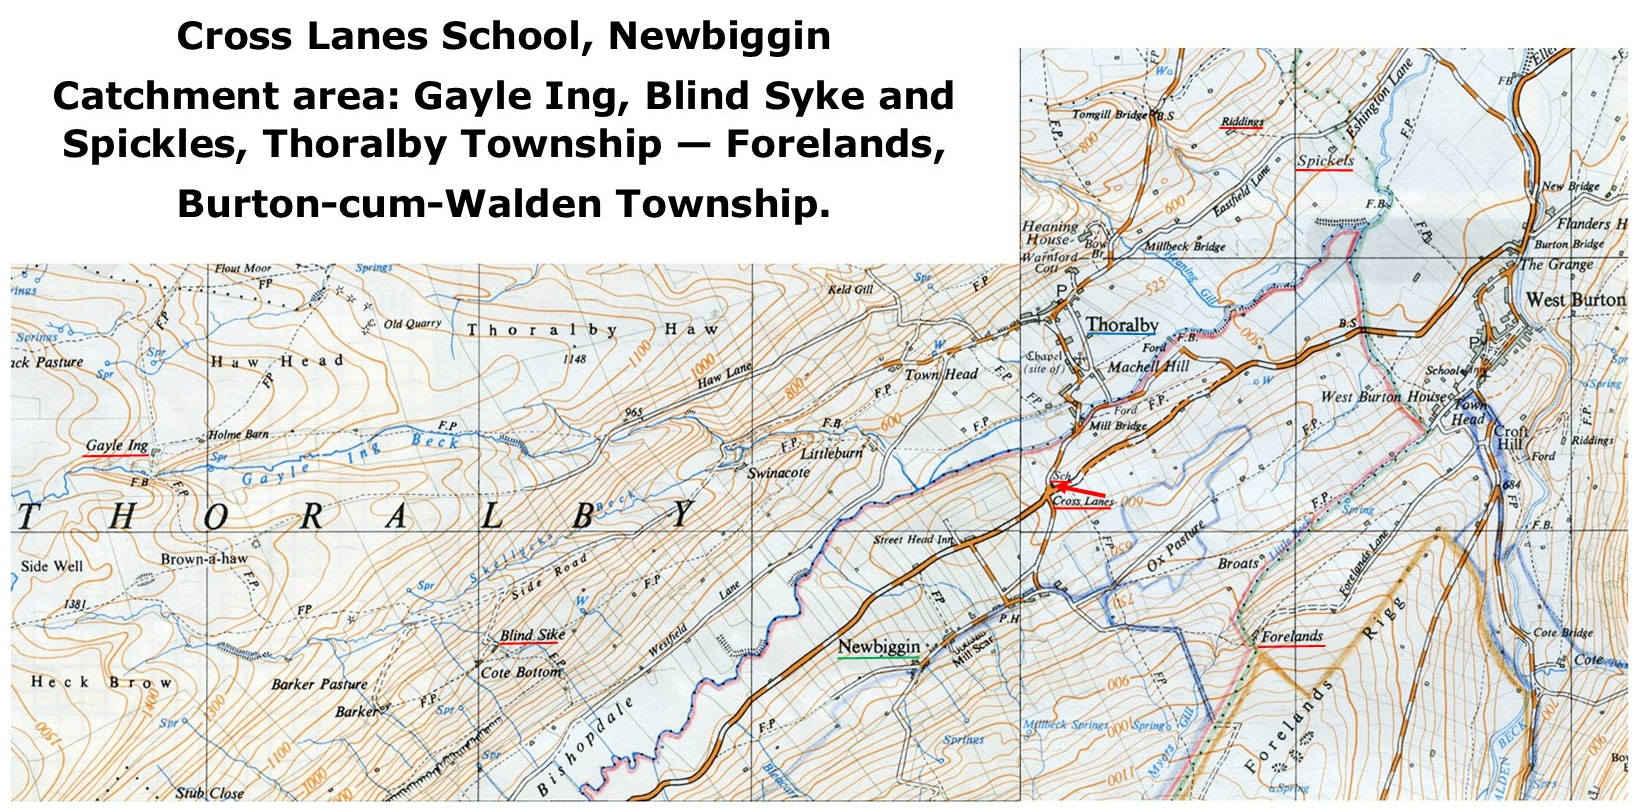 Cross Lanes School - catchment area